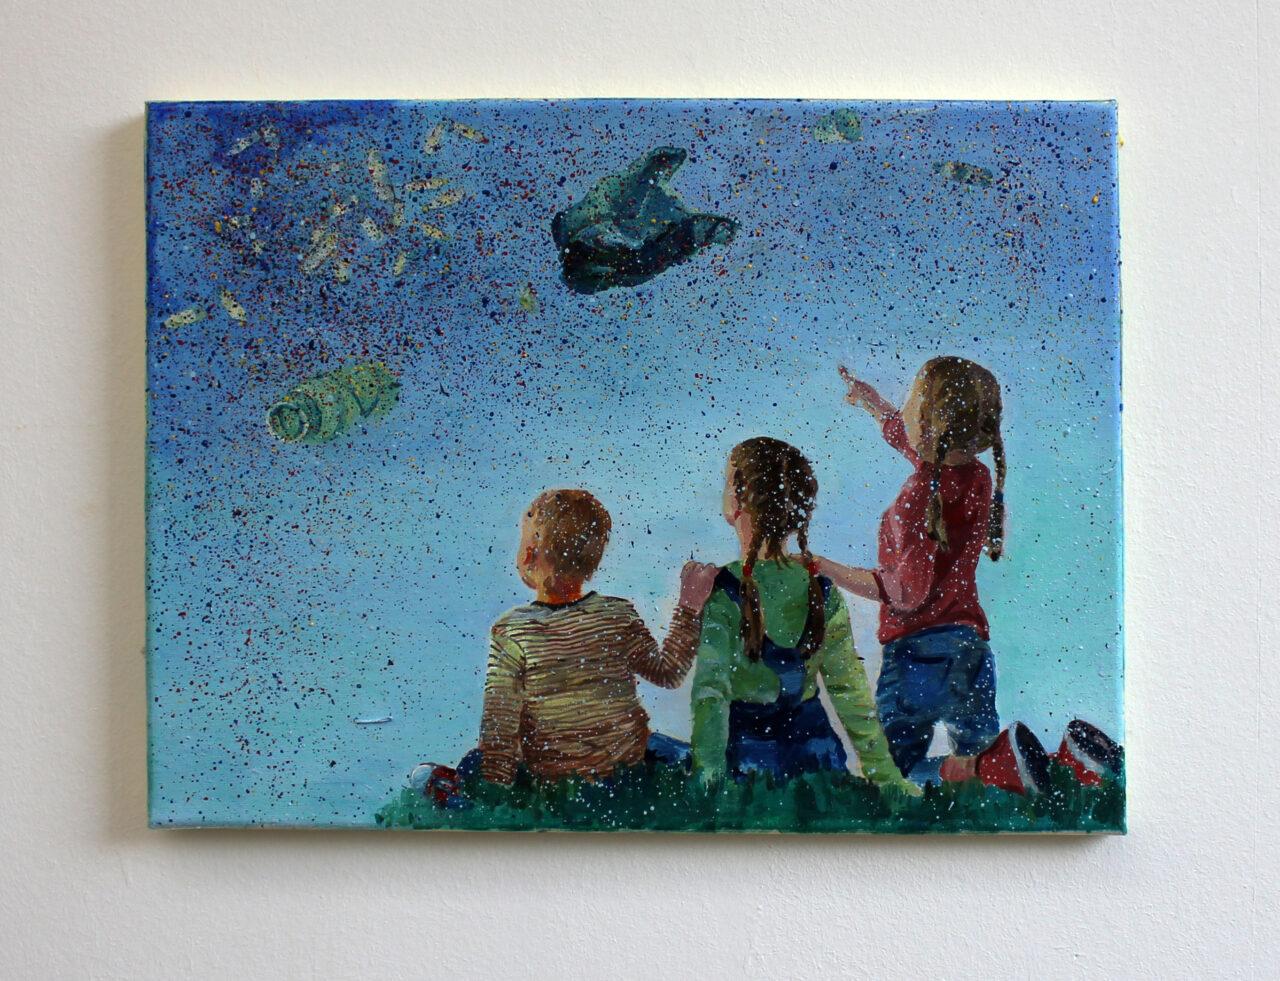 I spy, 2020, oil on canvas, 30x40 cm